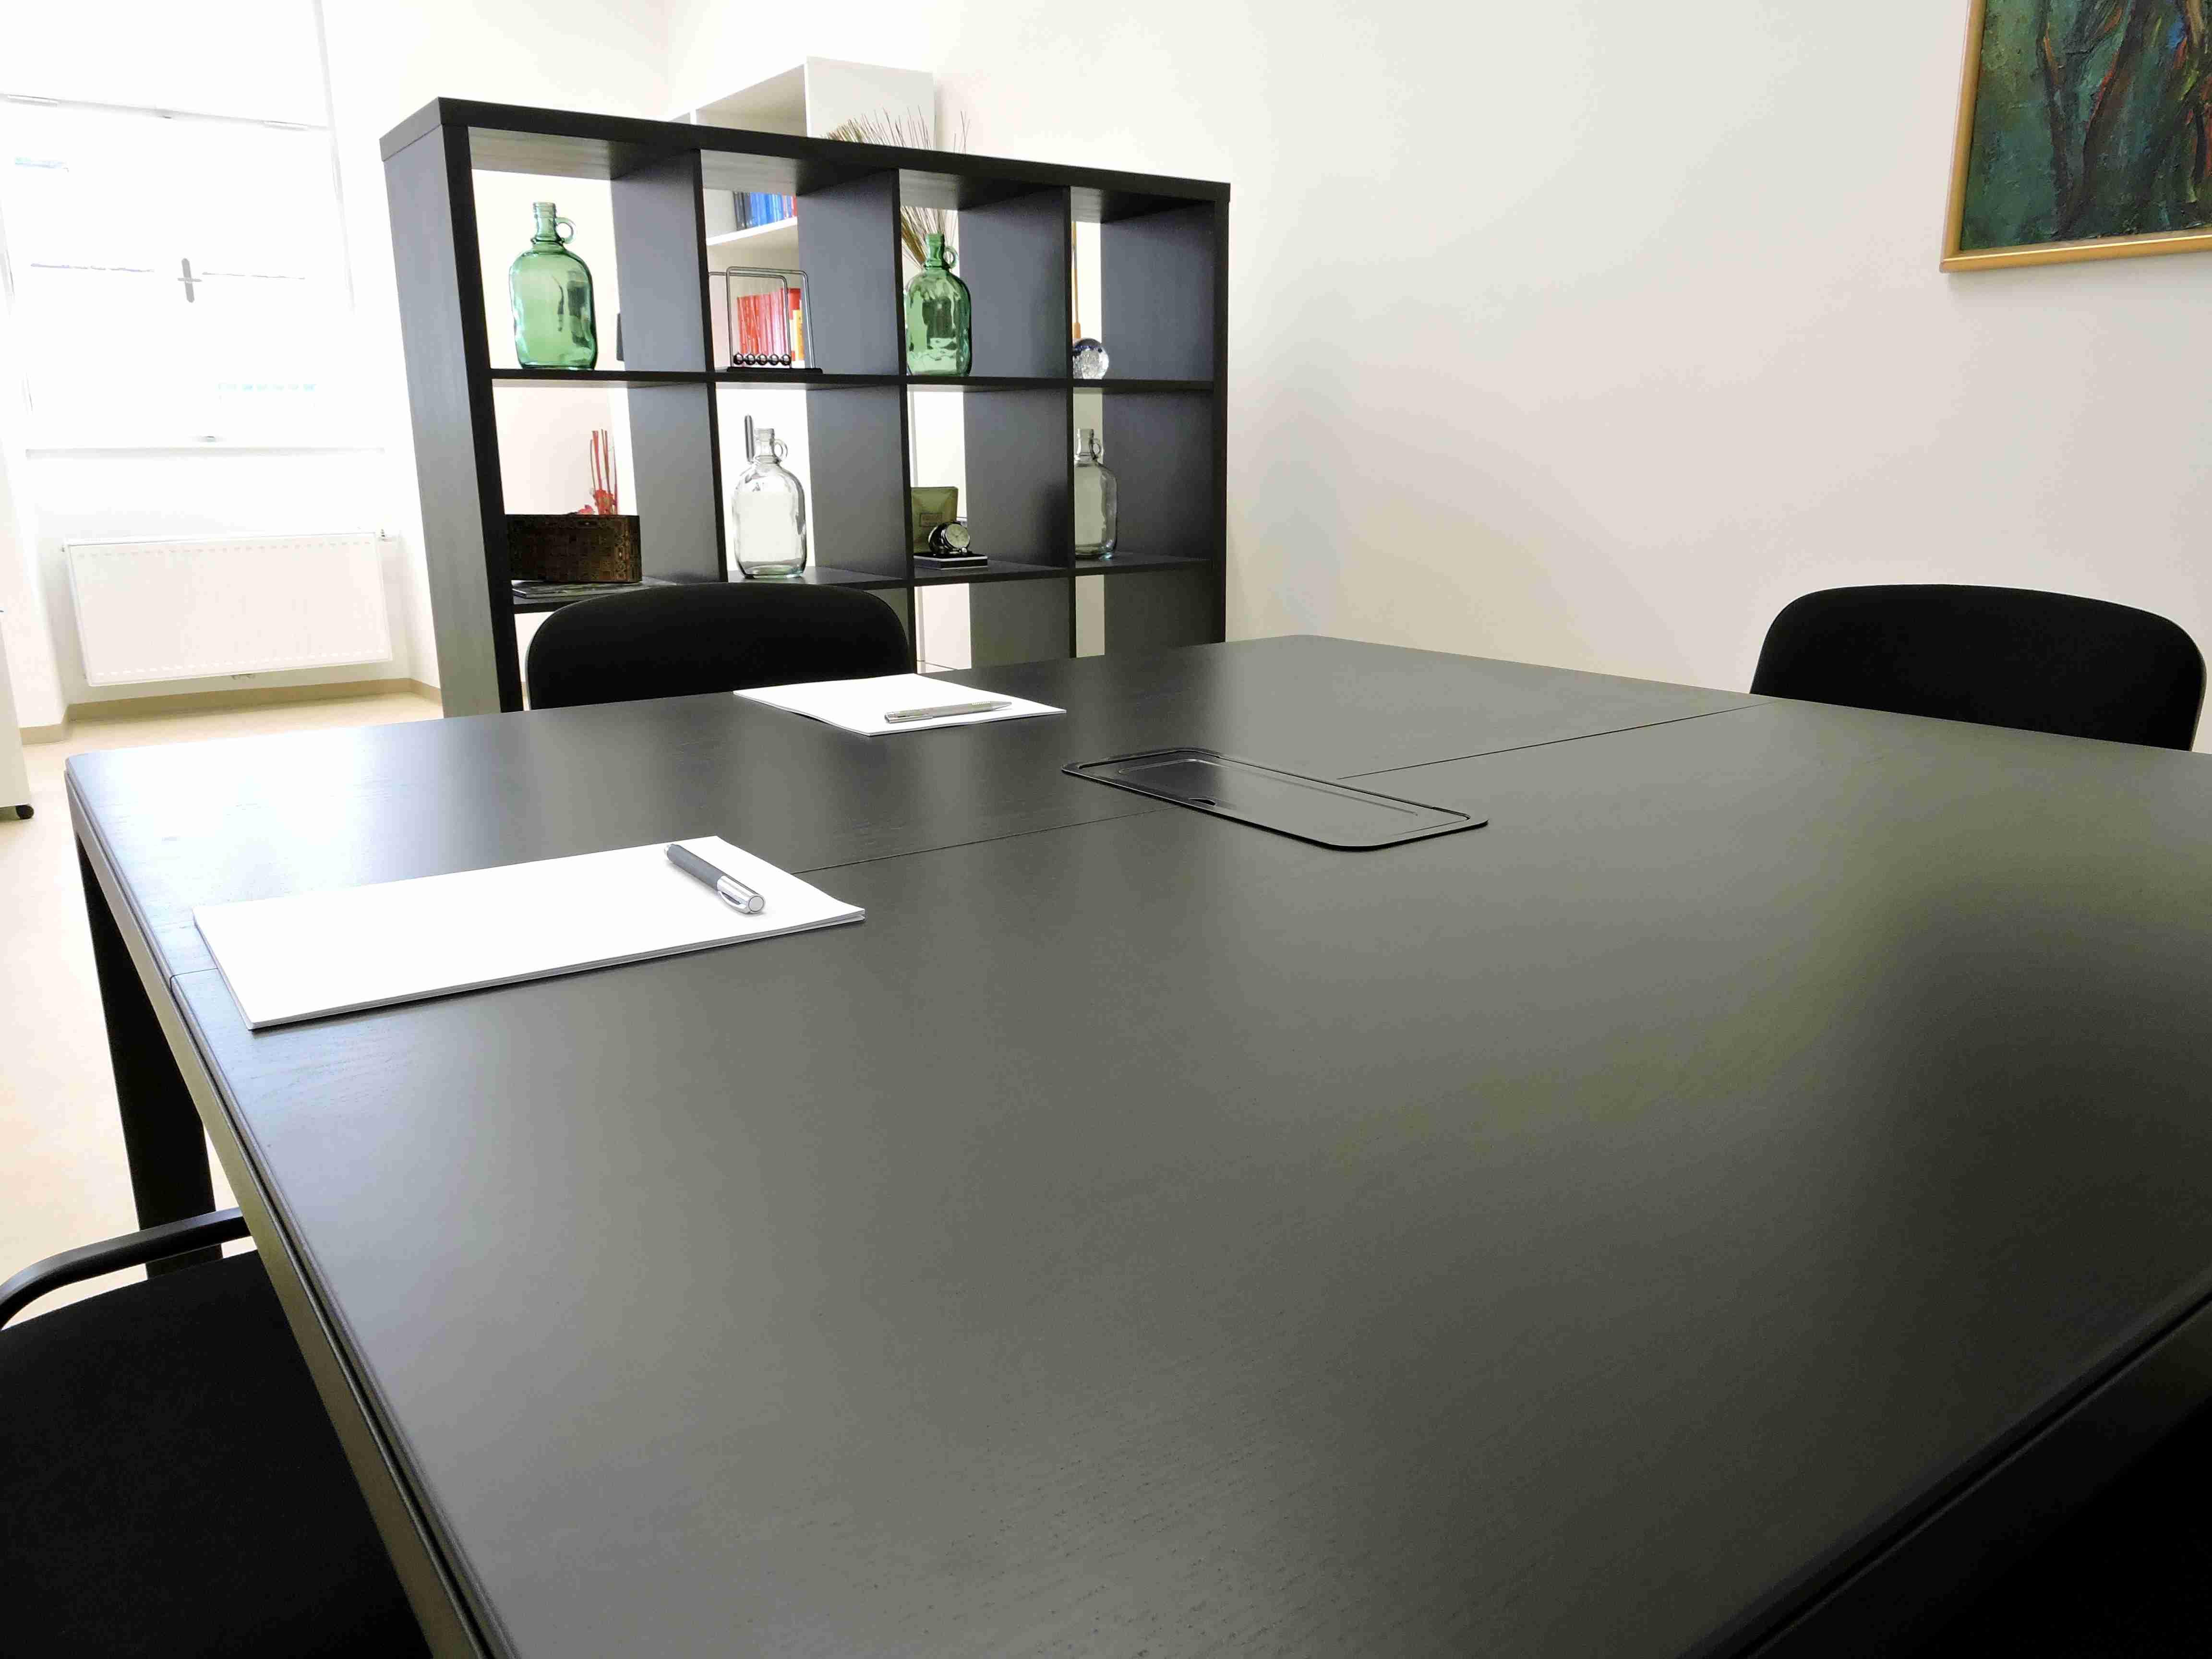 Tisch Dr. Anton Pirringer 2460 Bruck an der Leitha 2413 Berg Rechtsanwalt Anwalt